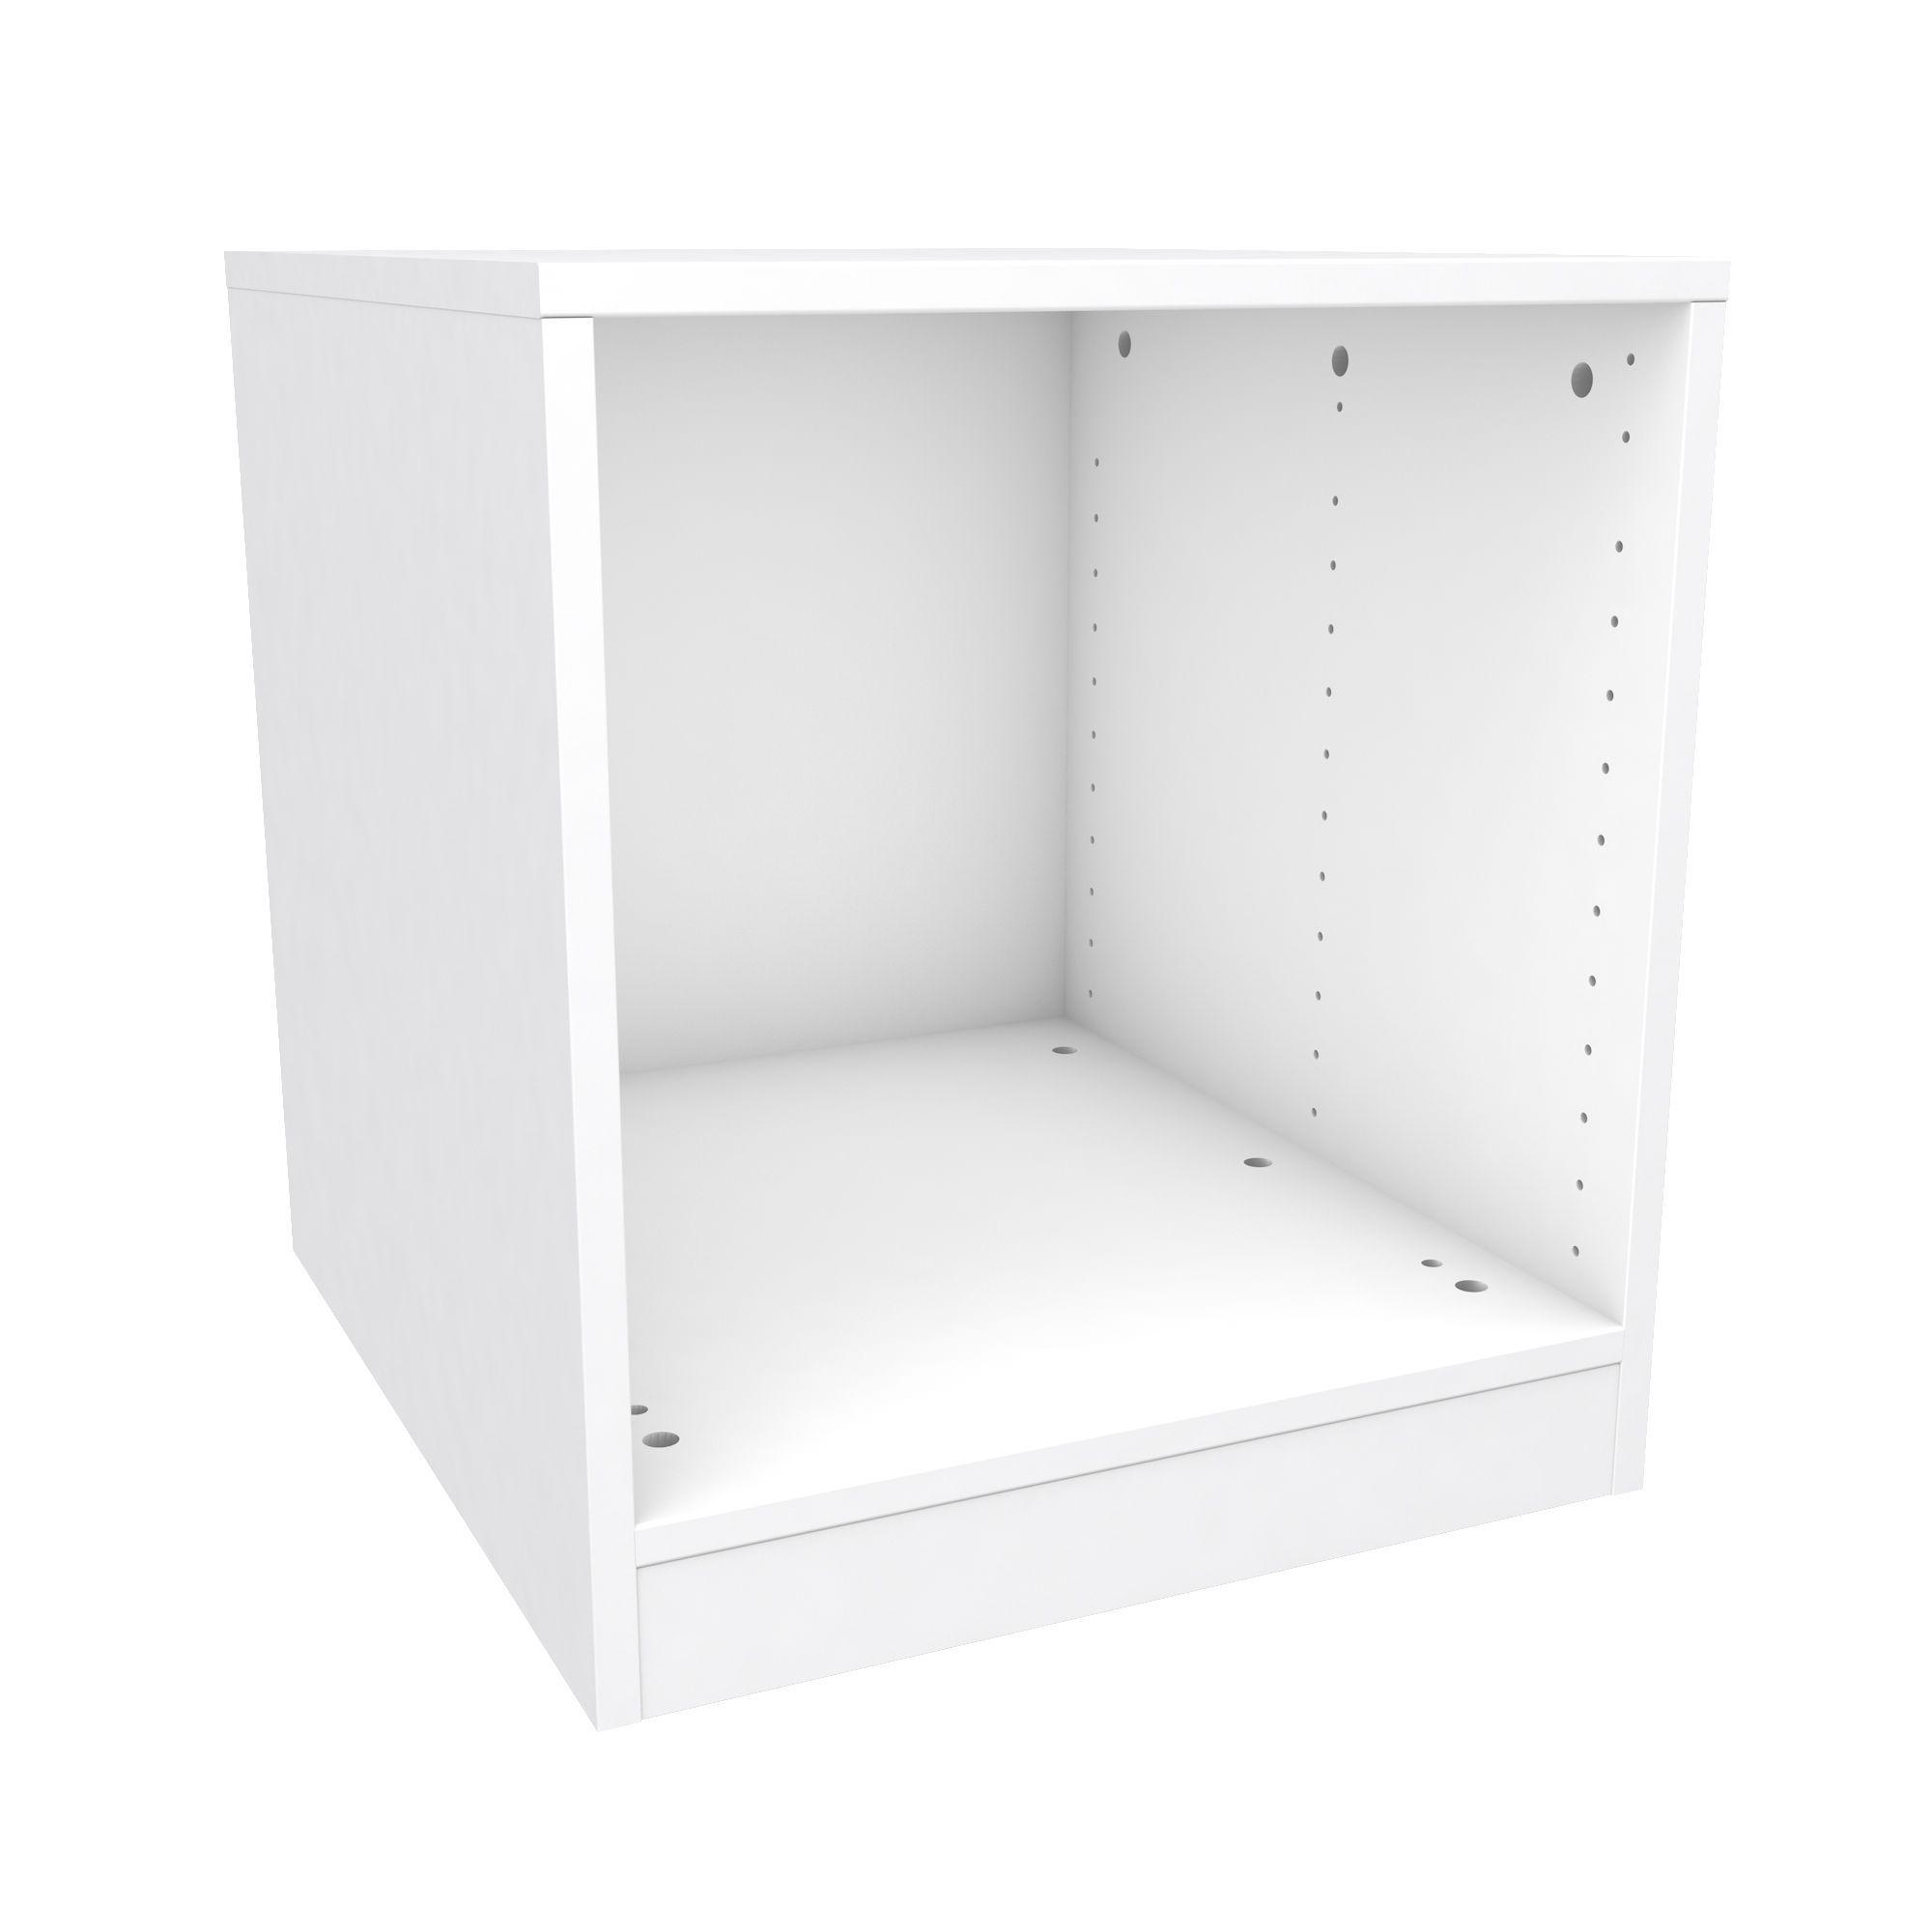 Darwin Modular White Bedside Cabinet (h)546mm (w)500mm (d)566mm